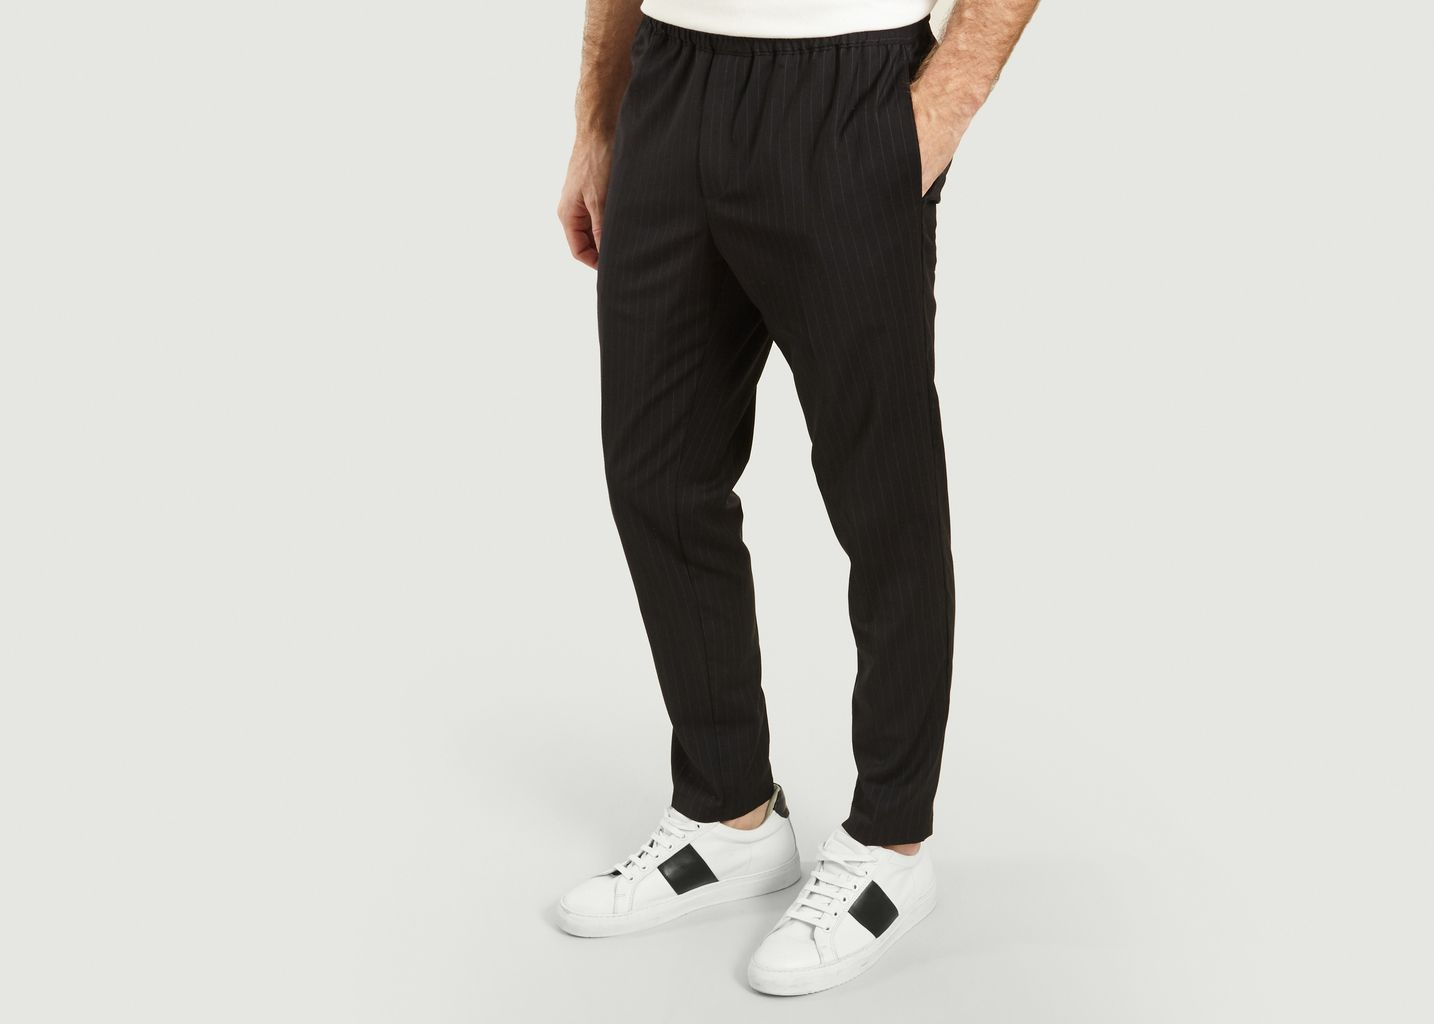 Pantalon Smithy à Fines Rayures - Samsoe Samsoe